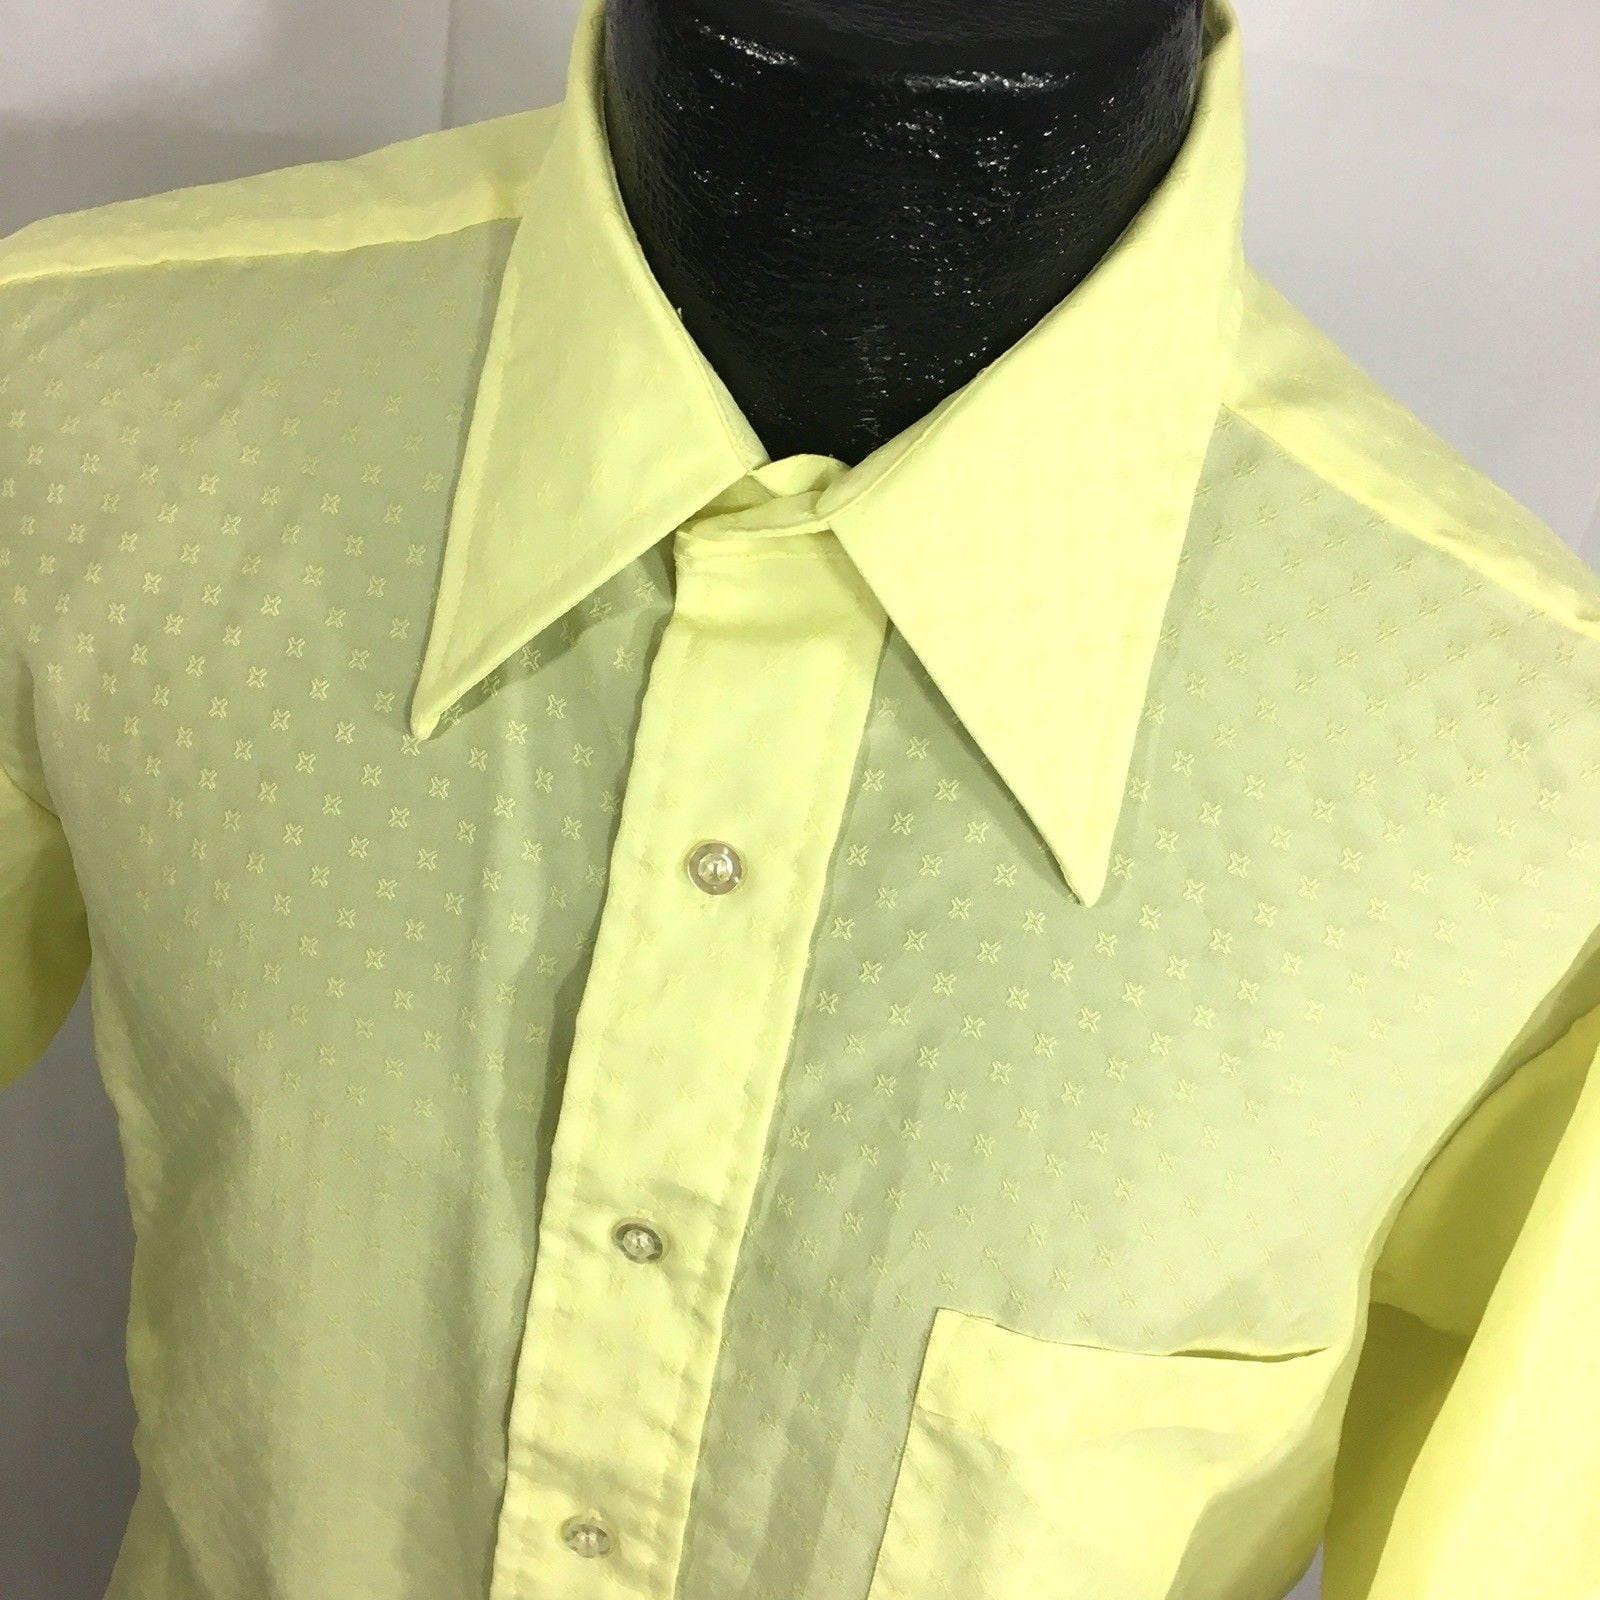 1970s Men's Shirt Styles – Vintage 70s Shirts for Guys Mj Vintage Vtg 60 70s Men Mod Yellow Atomic Stars Short Sleeve Thin Disco Shirt 16.5 12 $39.99 AT vintagedancer.com